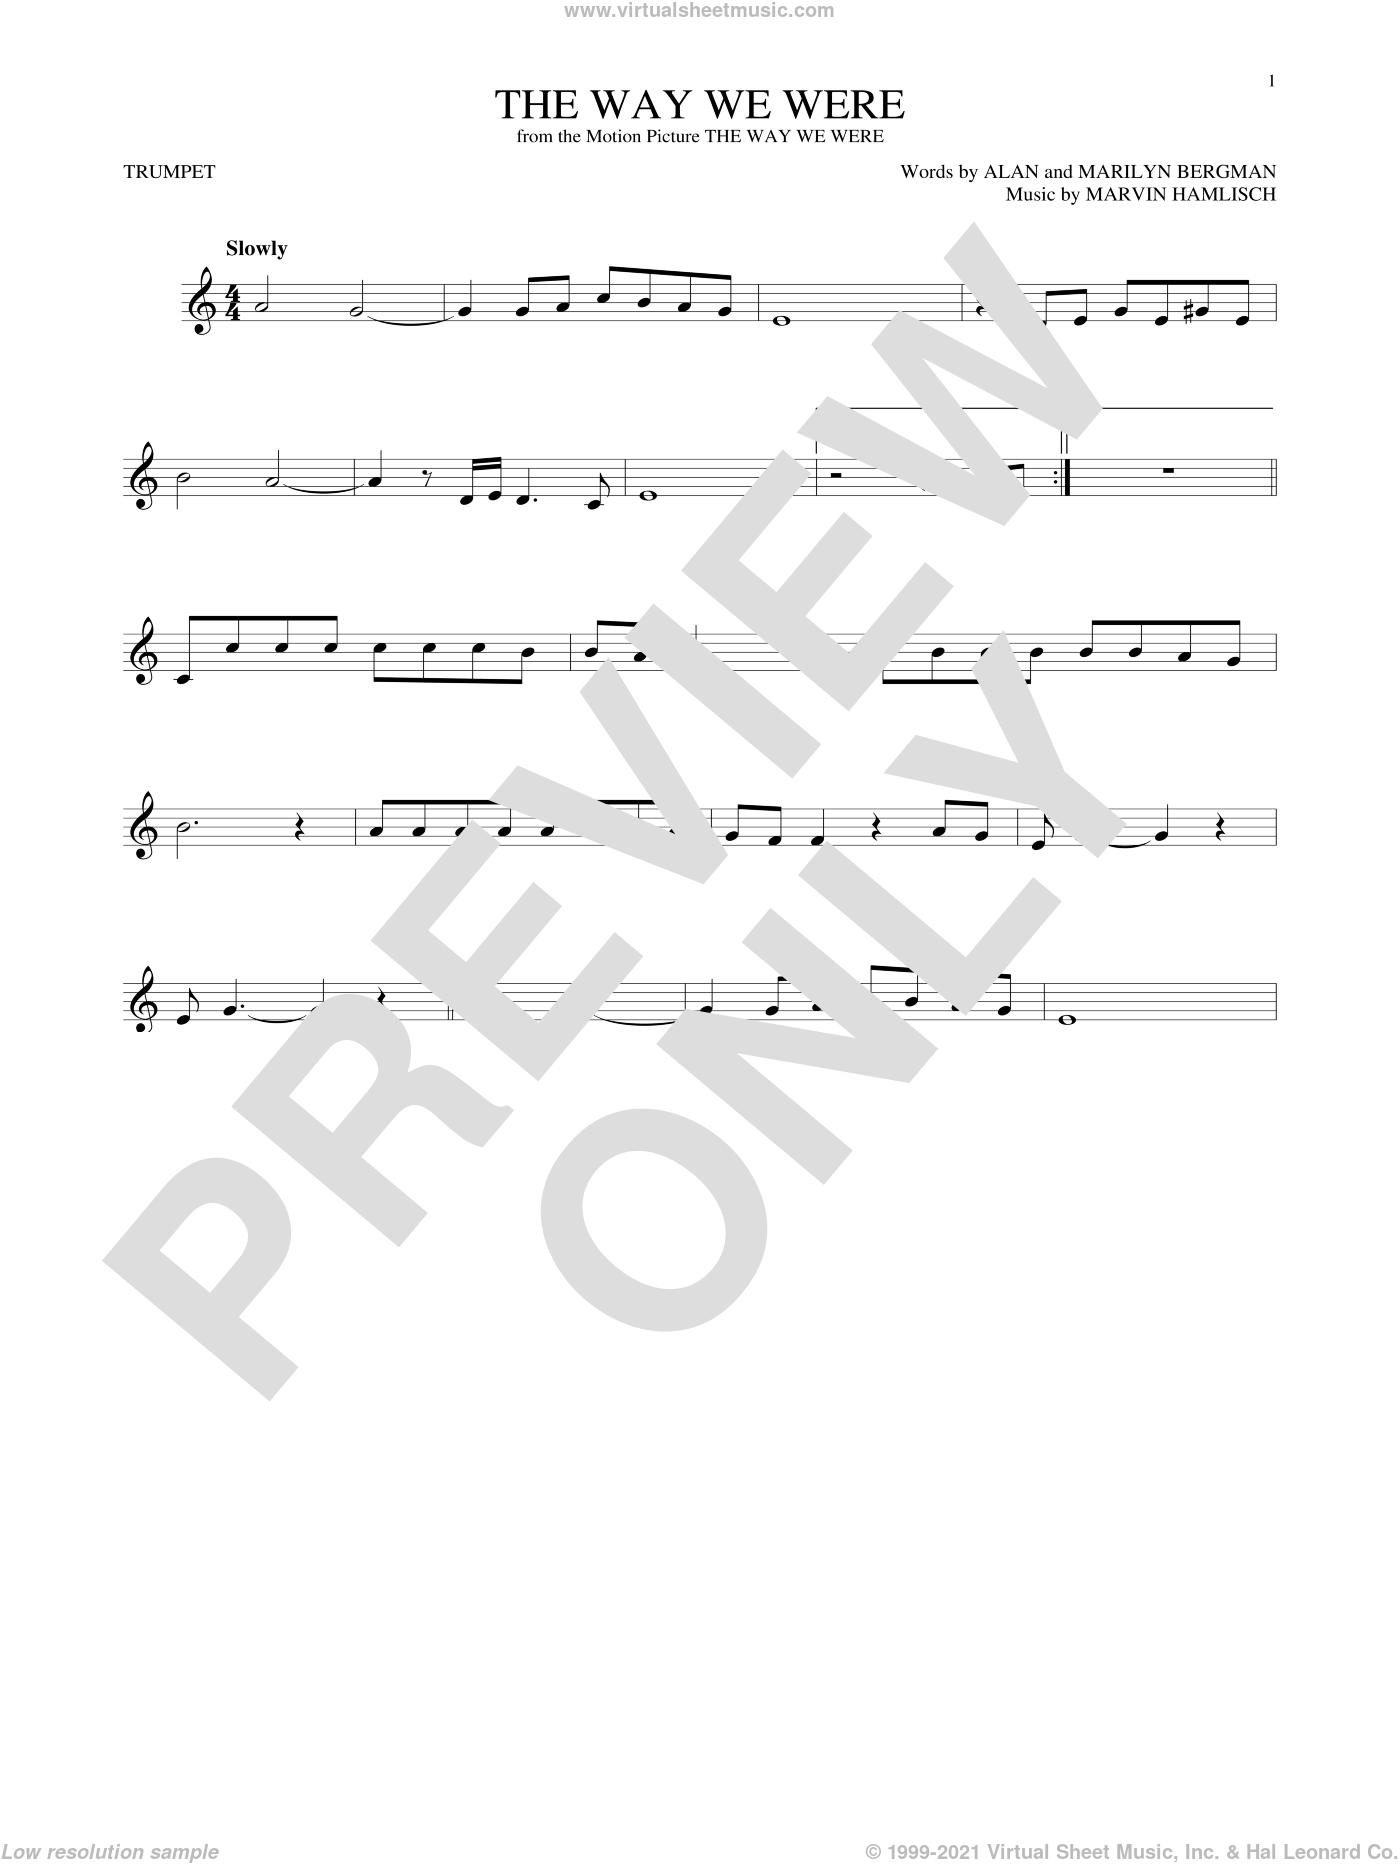 The Way We Were sheet music for trumpet solo by Barbra Streisand, Alan Bergman, Marilyn Bergman and Marvin Hamlisch, intermediate skill level